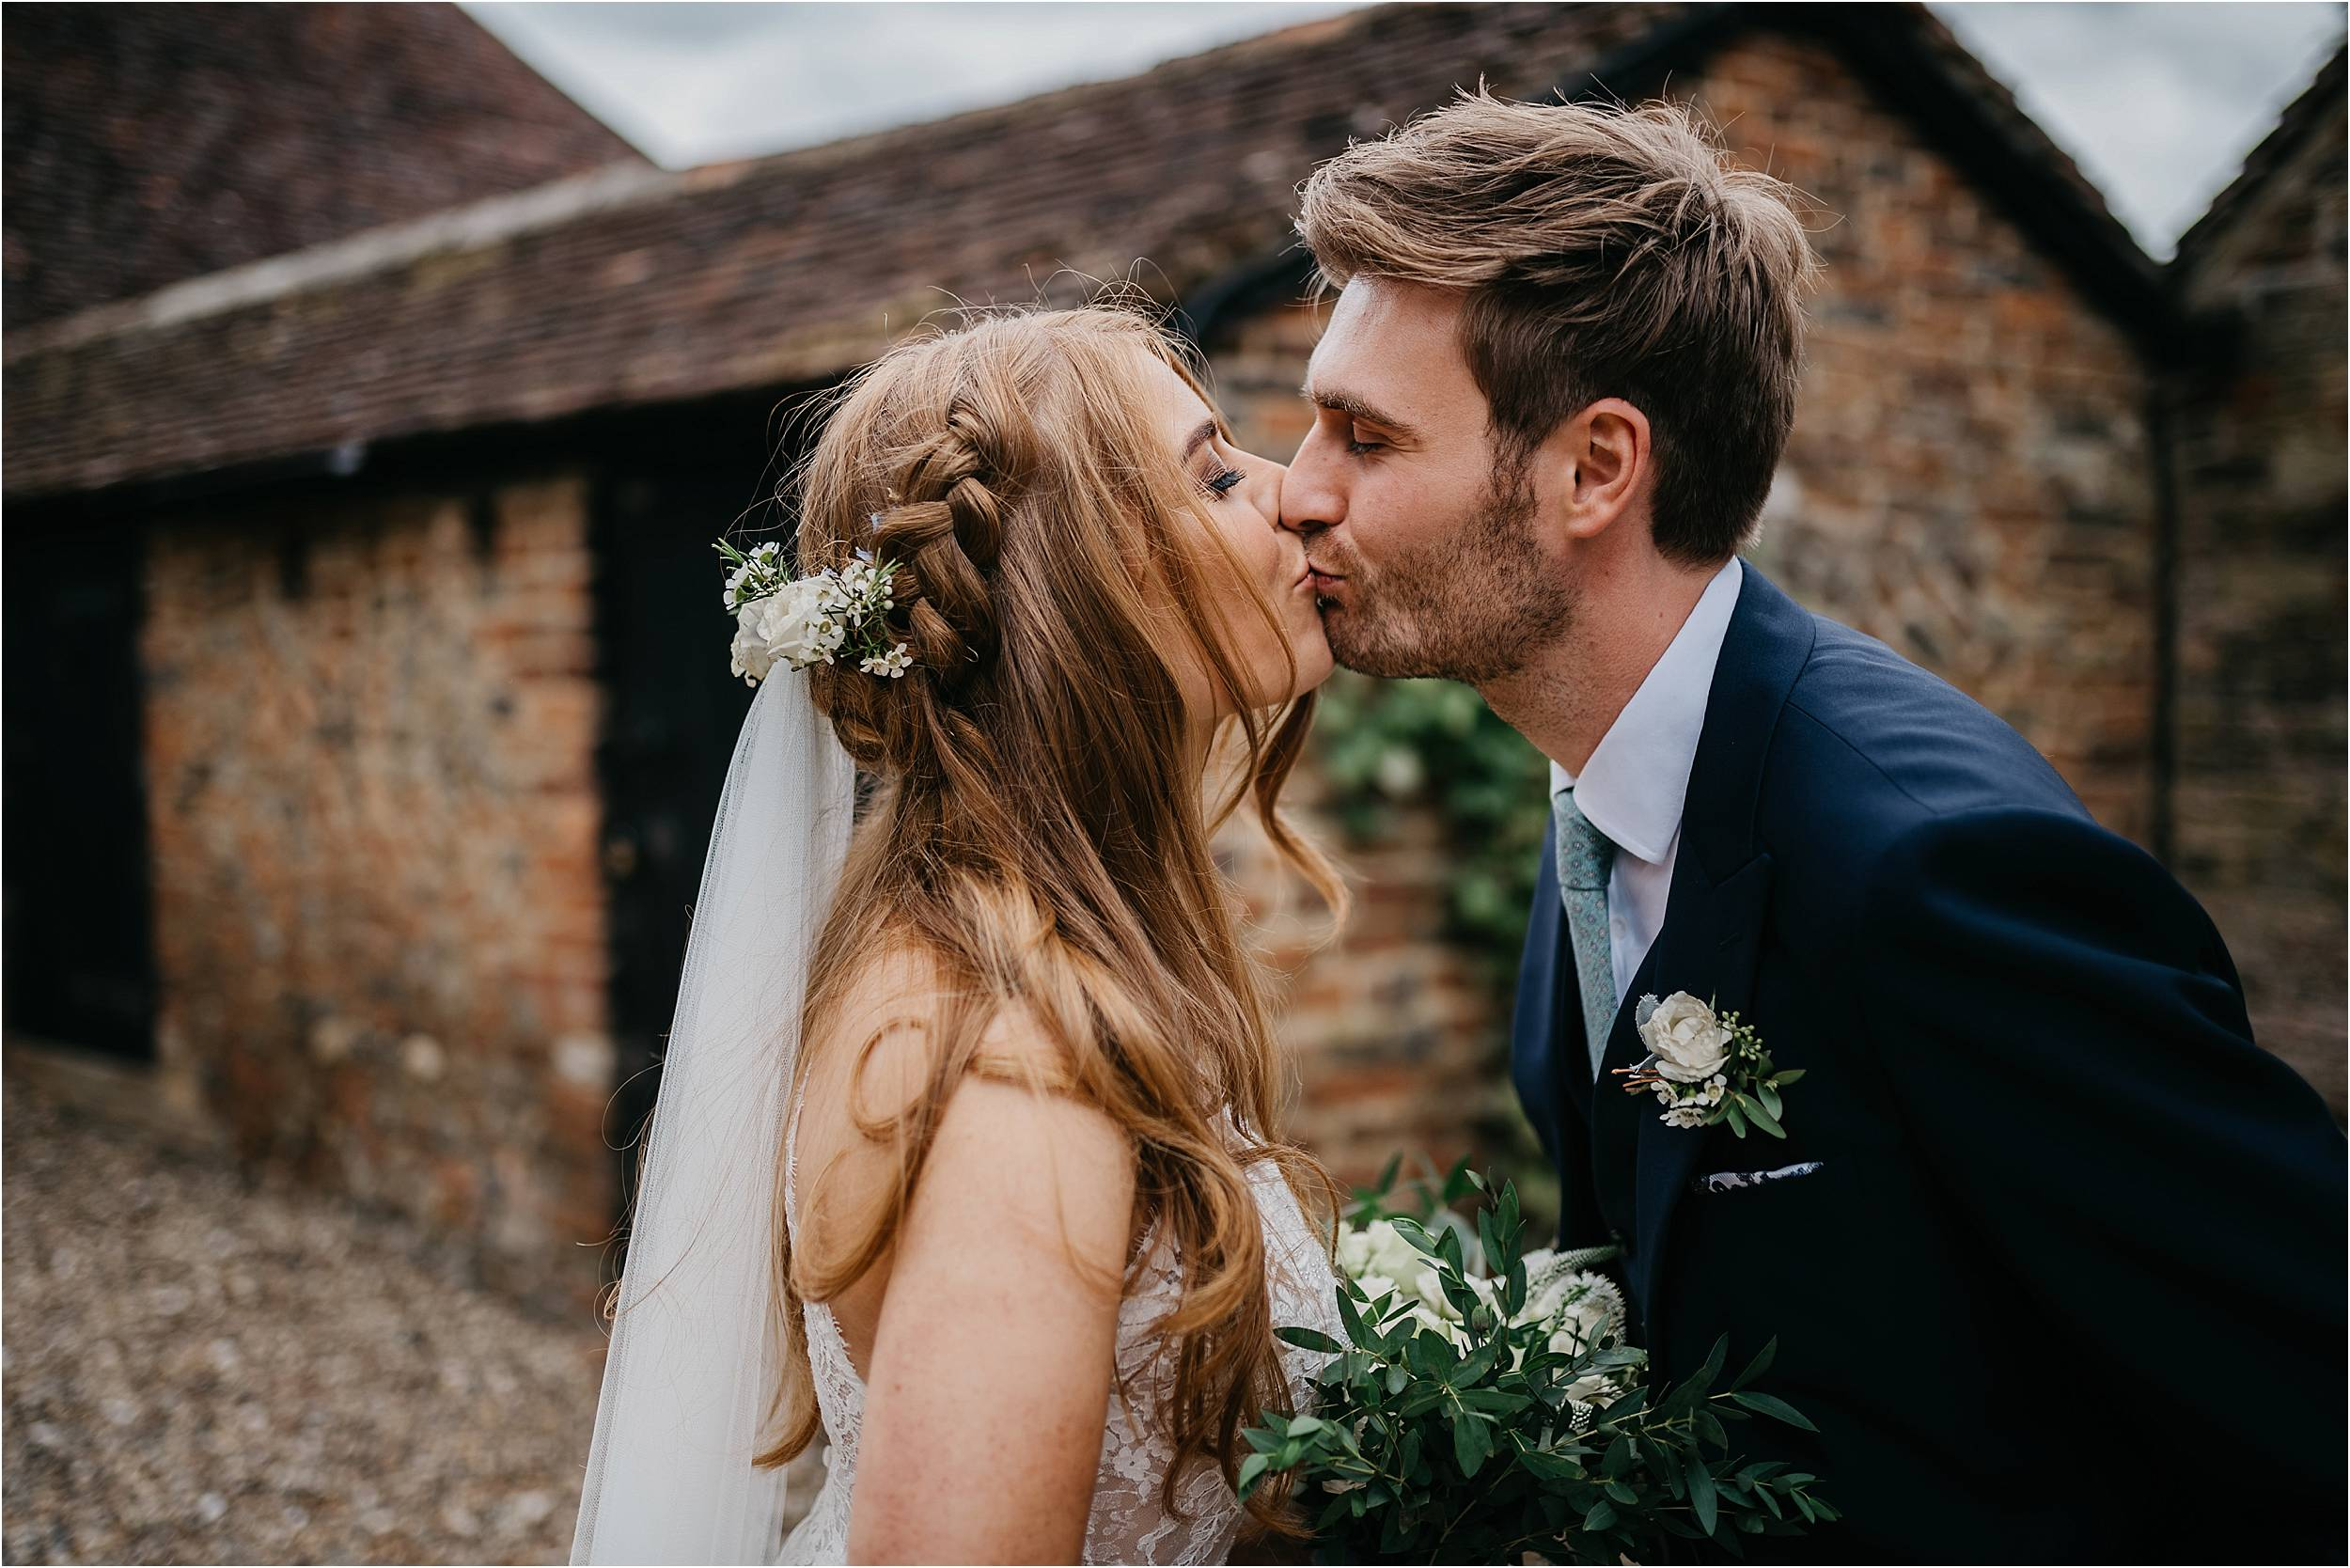 The Priory Little Wymondley Wedding Photography_0122.jpg